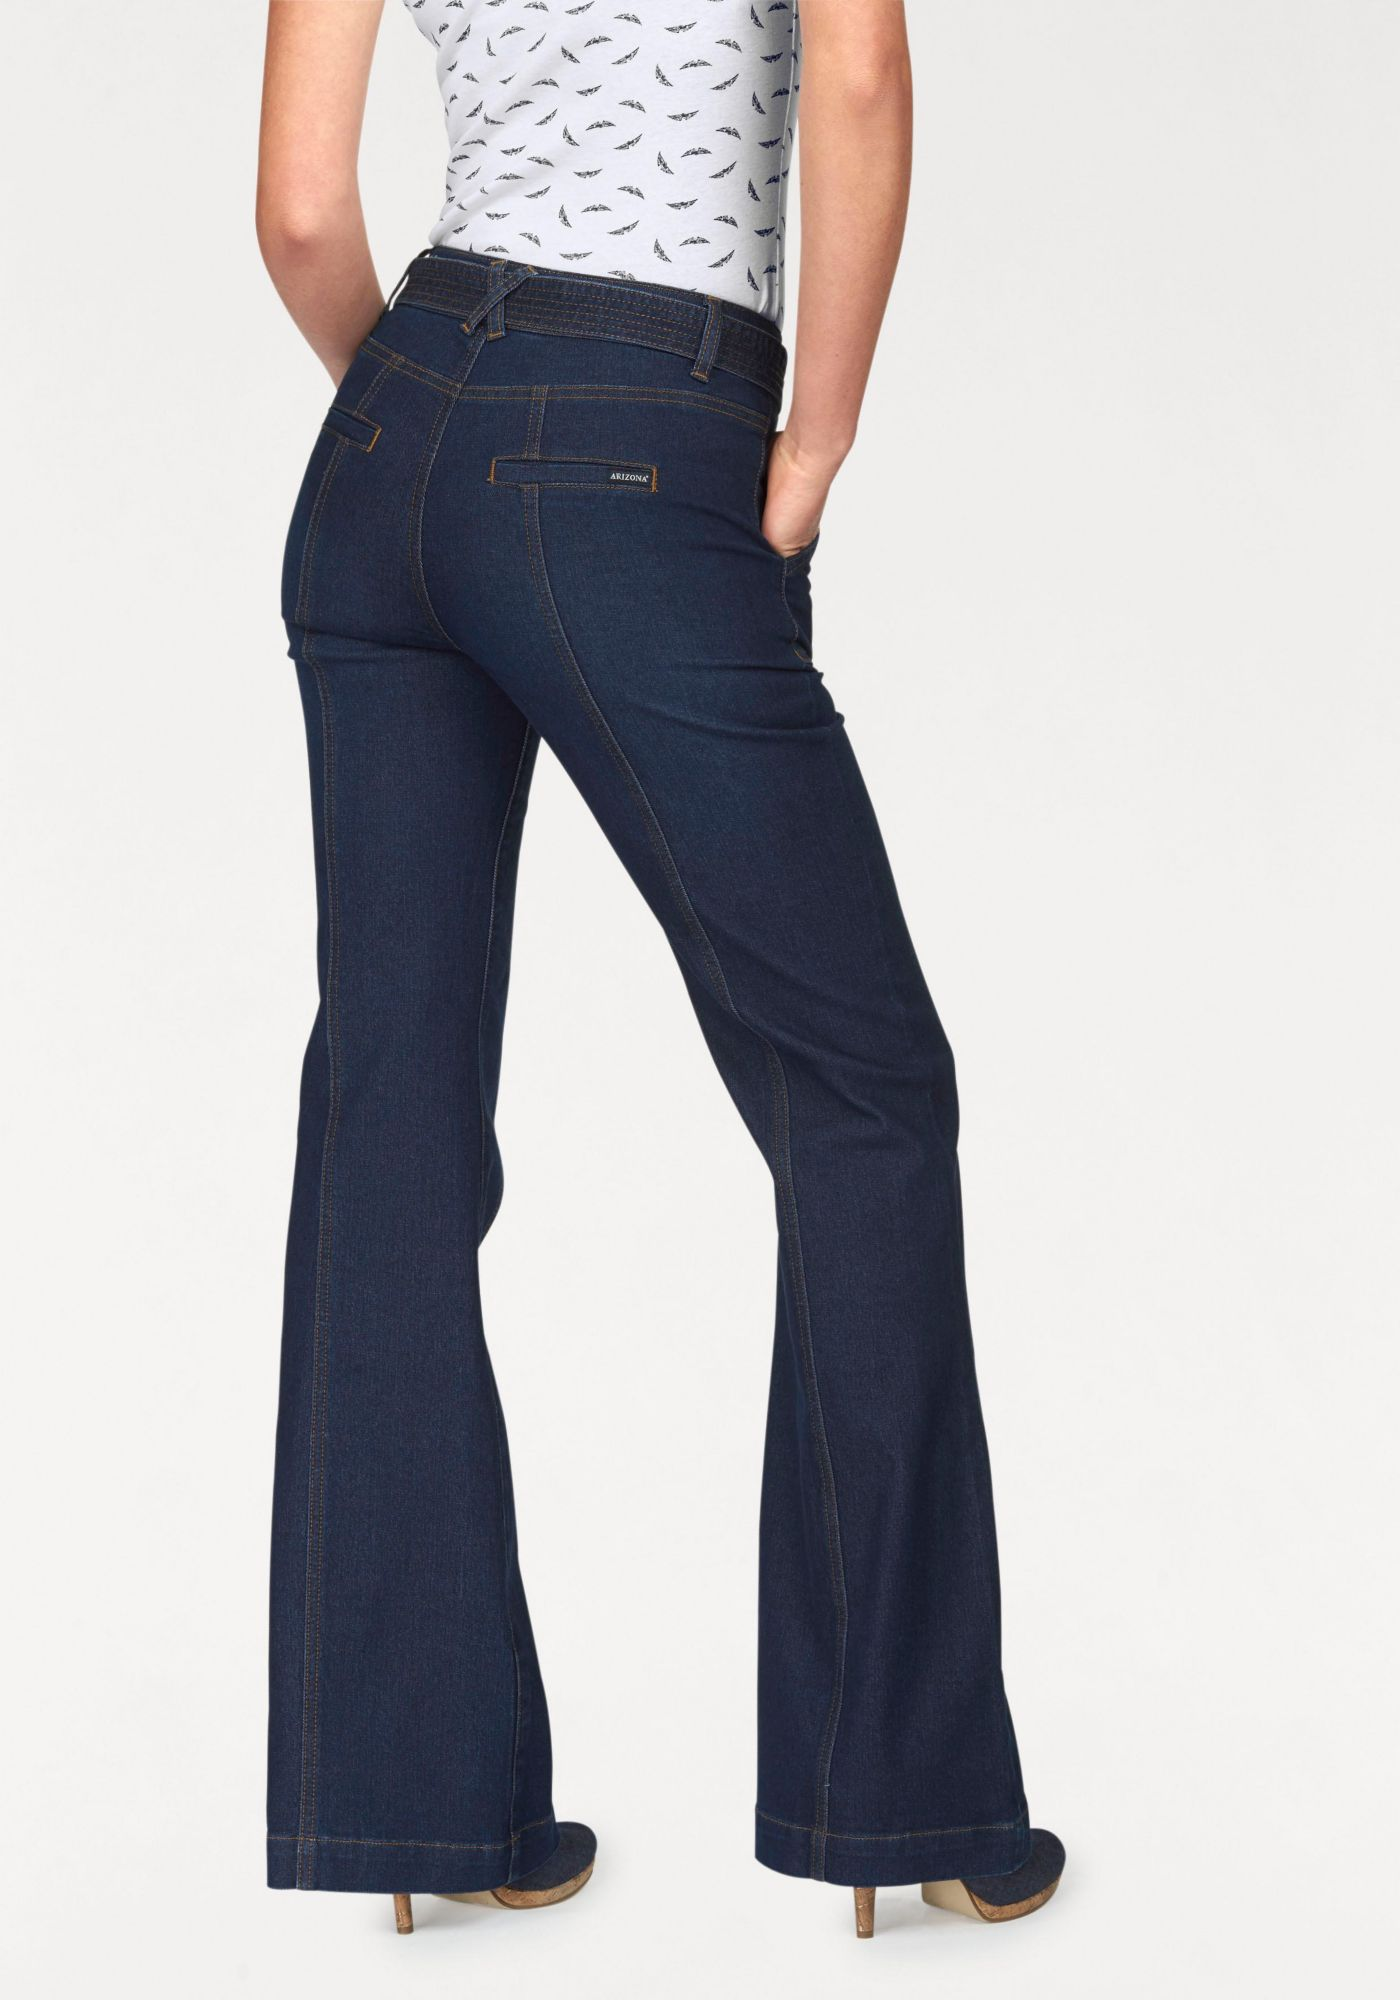 ARIZONA Arizona Bootcut-Jeans »Im Marlenestil mit Gürtel«